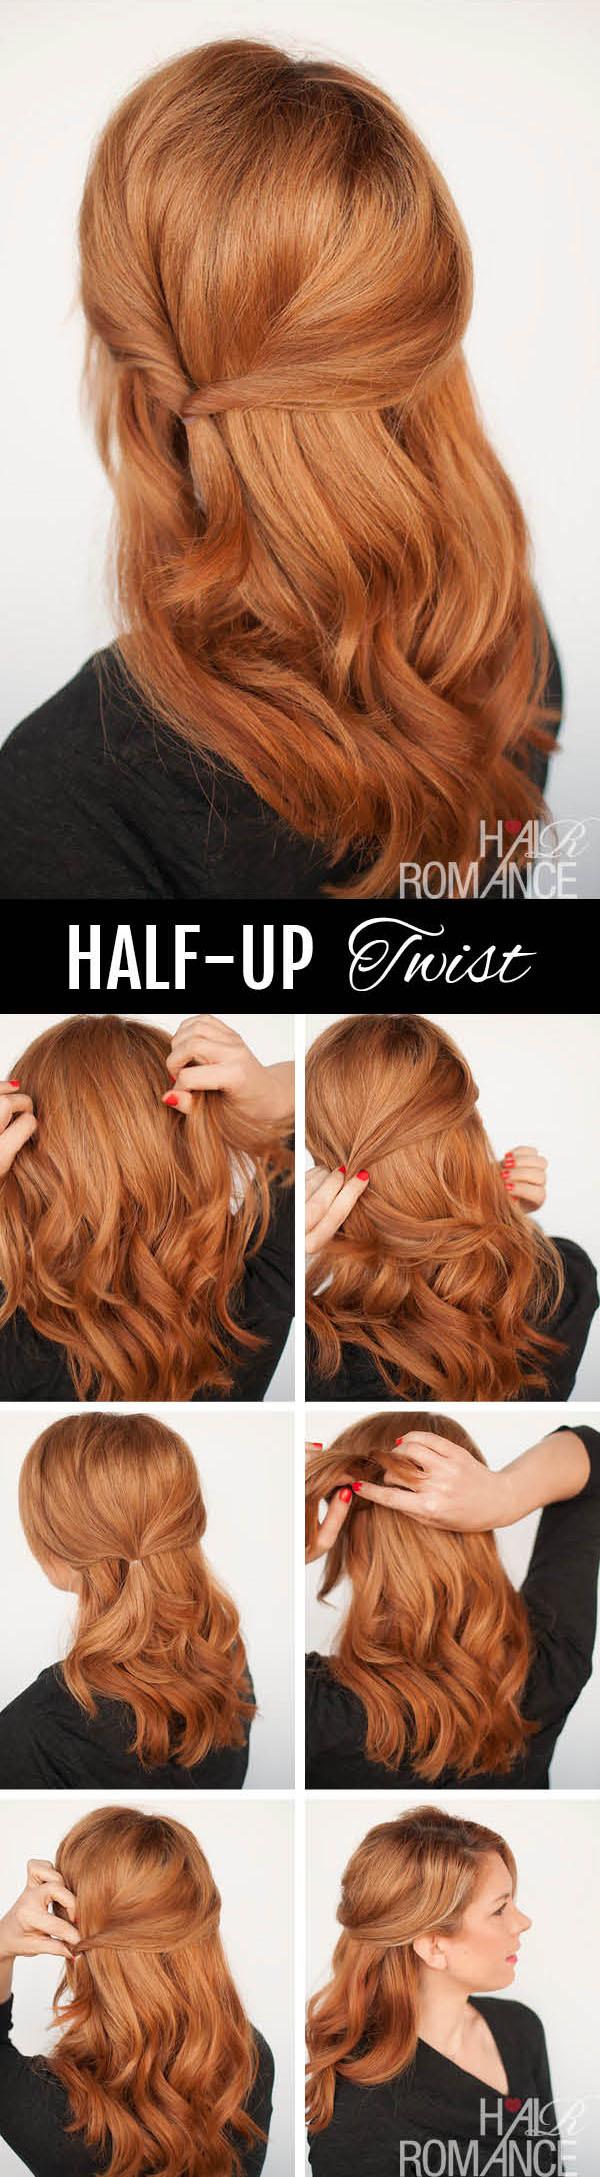 Hair-Romance-half-up-twist-hairstyle-tutorial.jpg